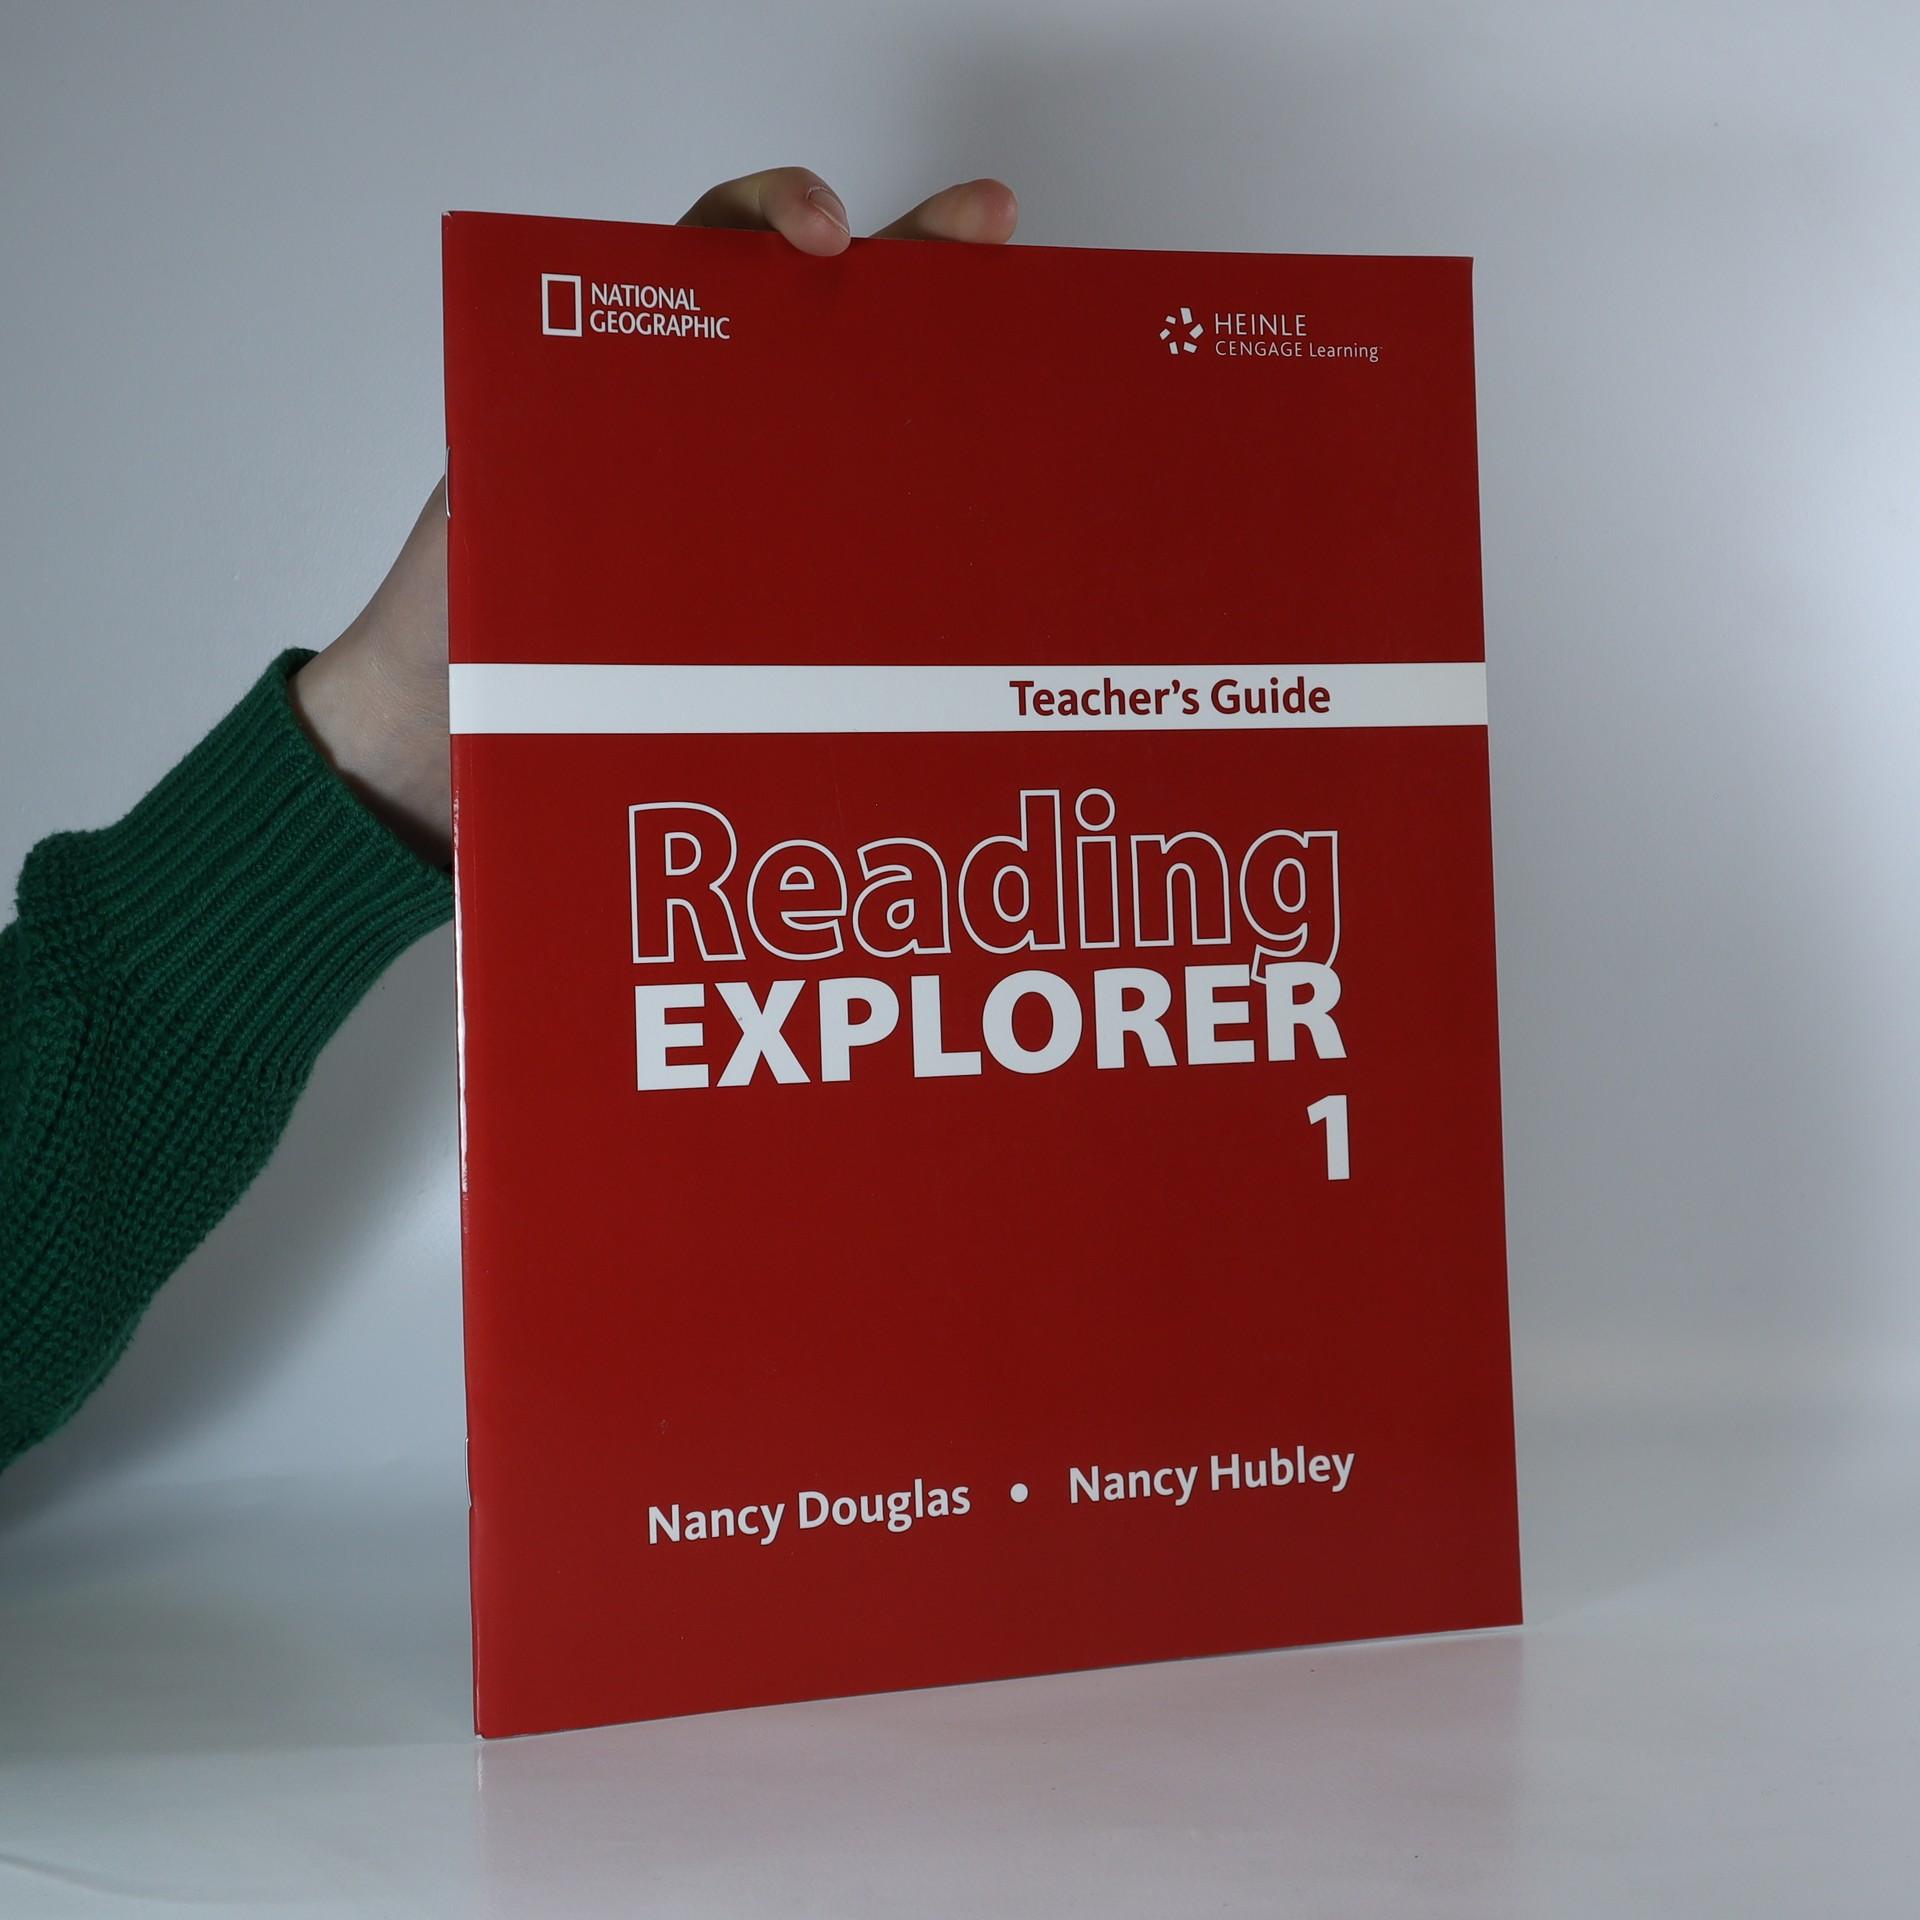 antikvární kniha Reading explorer 1 : teacher's guide, 2010